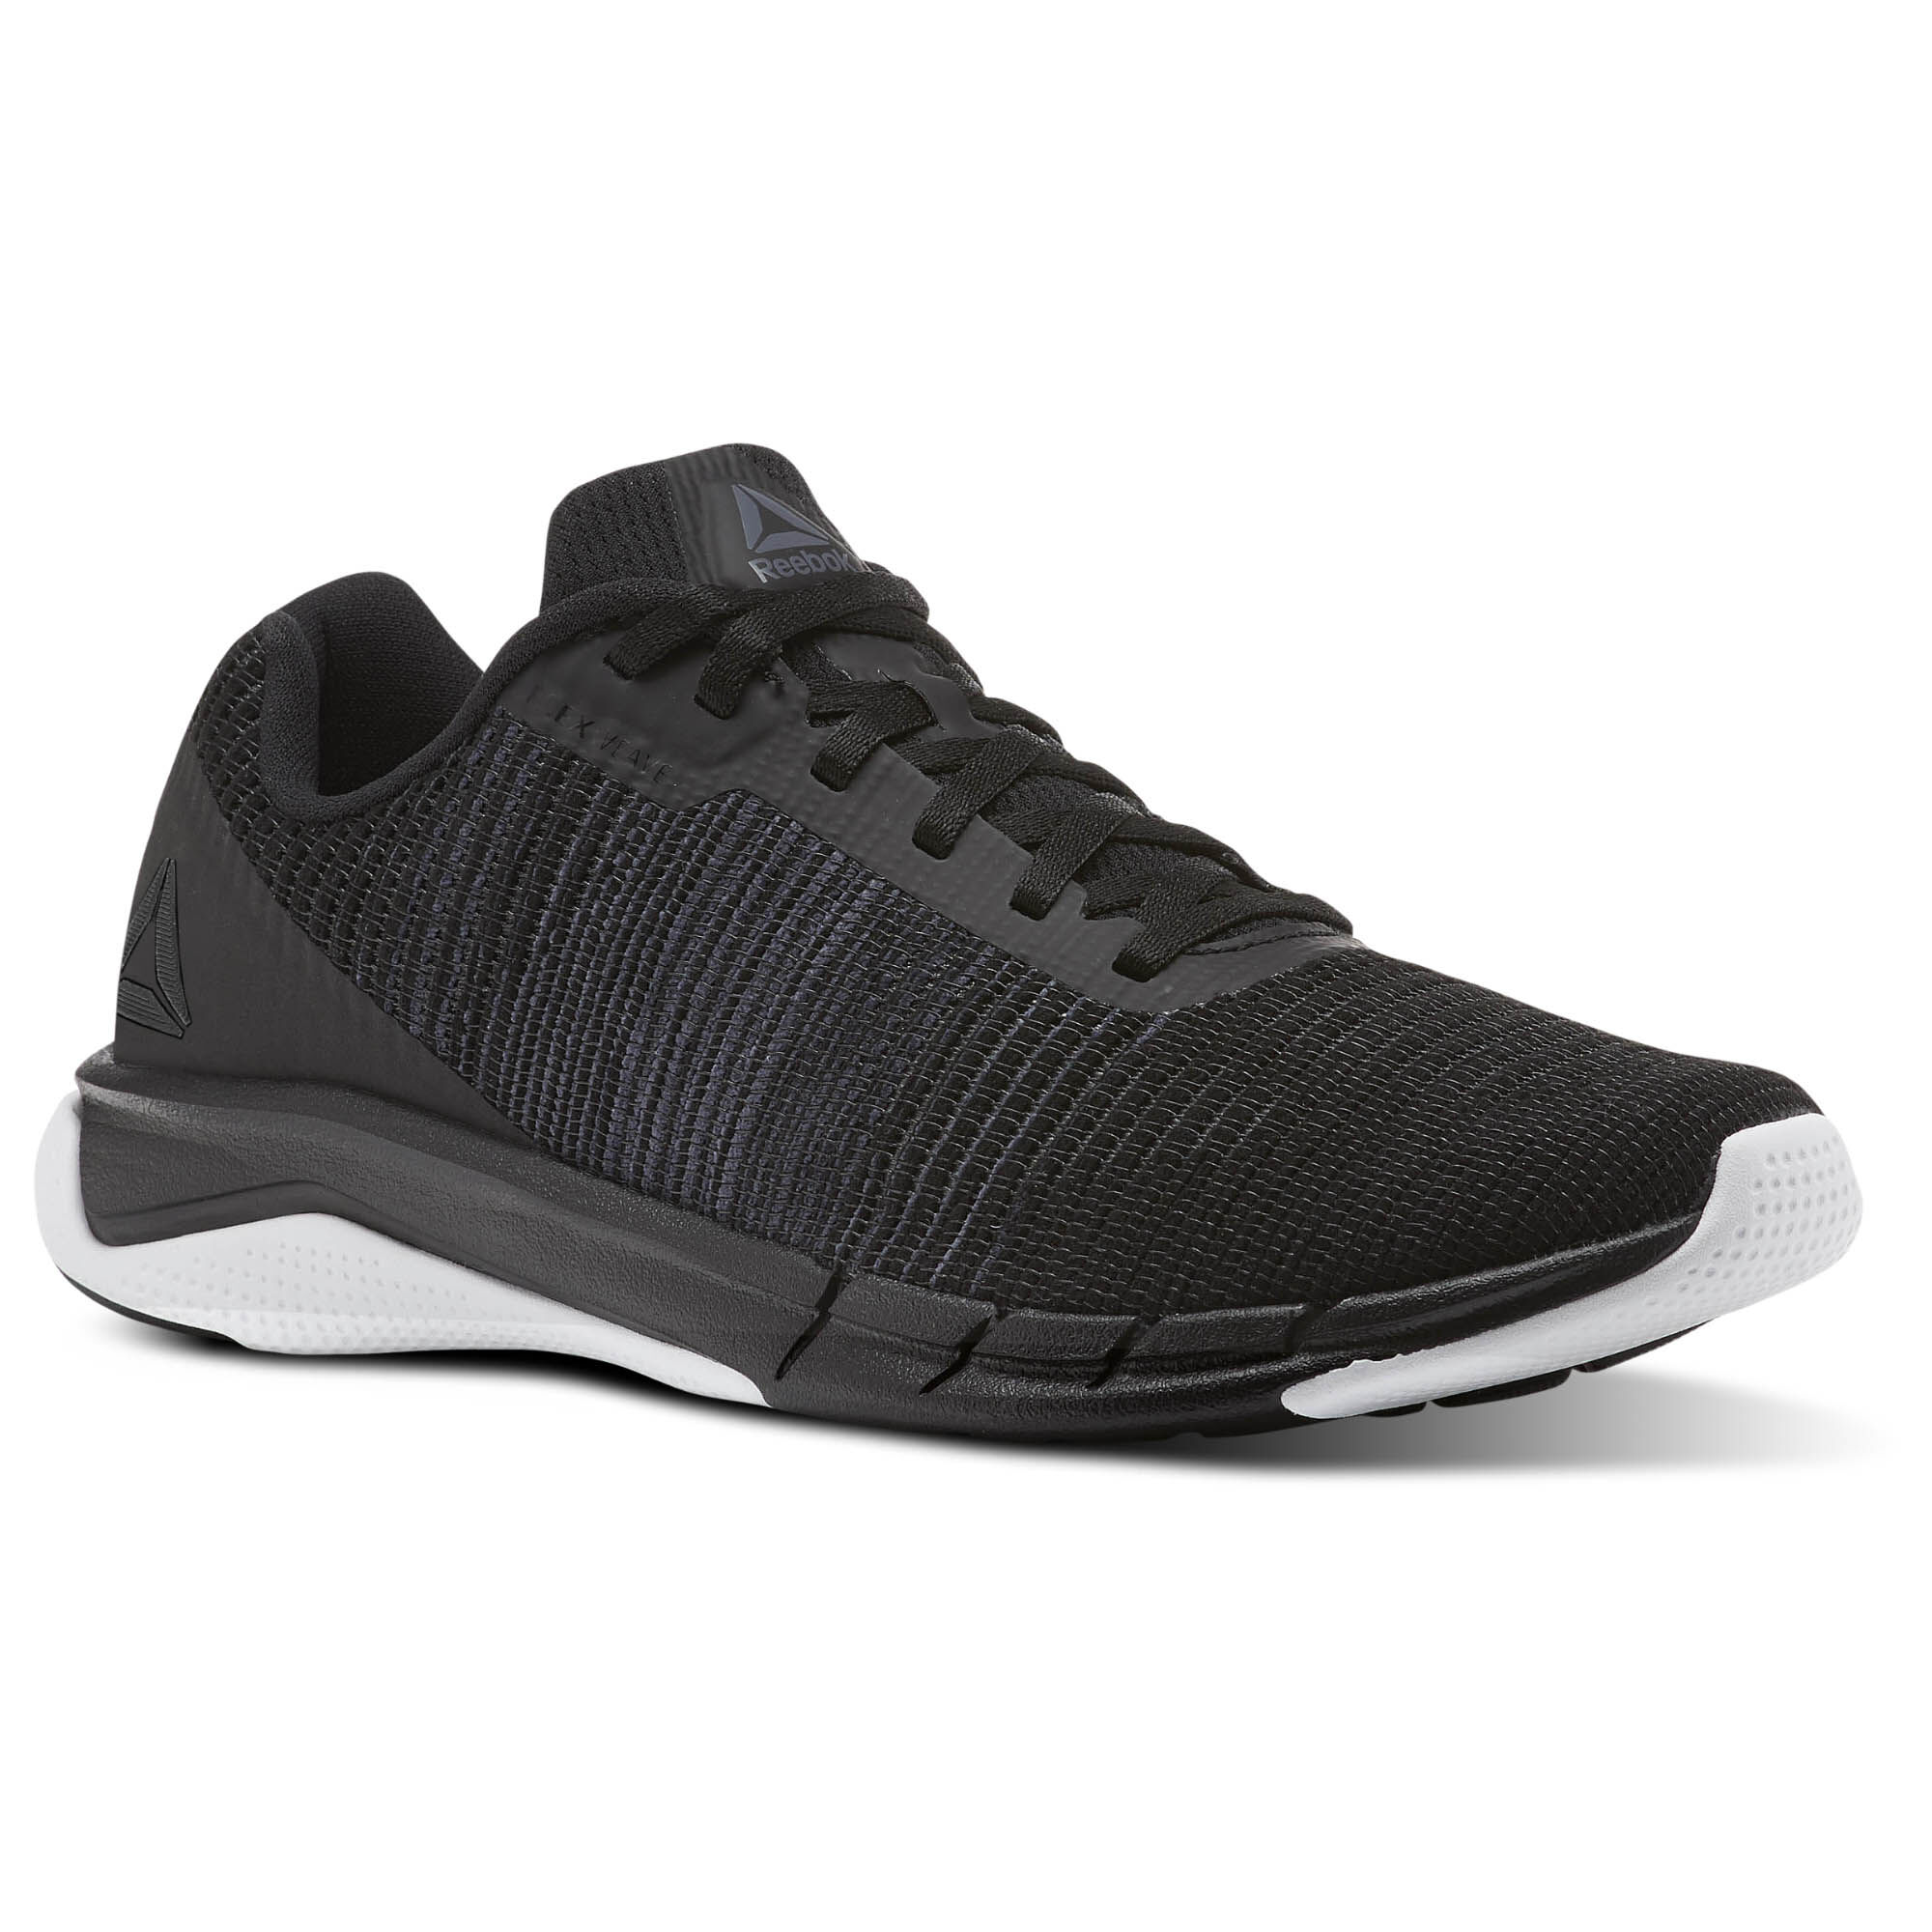 Reebok - Fast Flexweave Black/Ash Grey/White CN1600